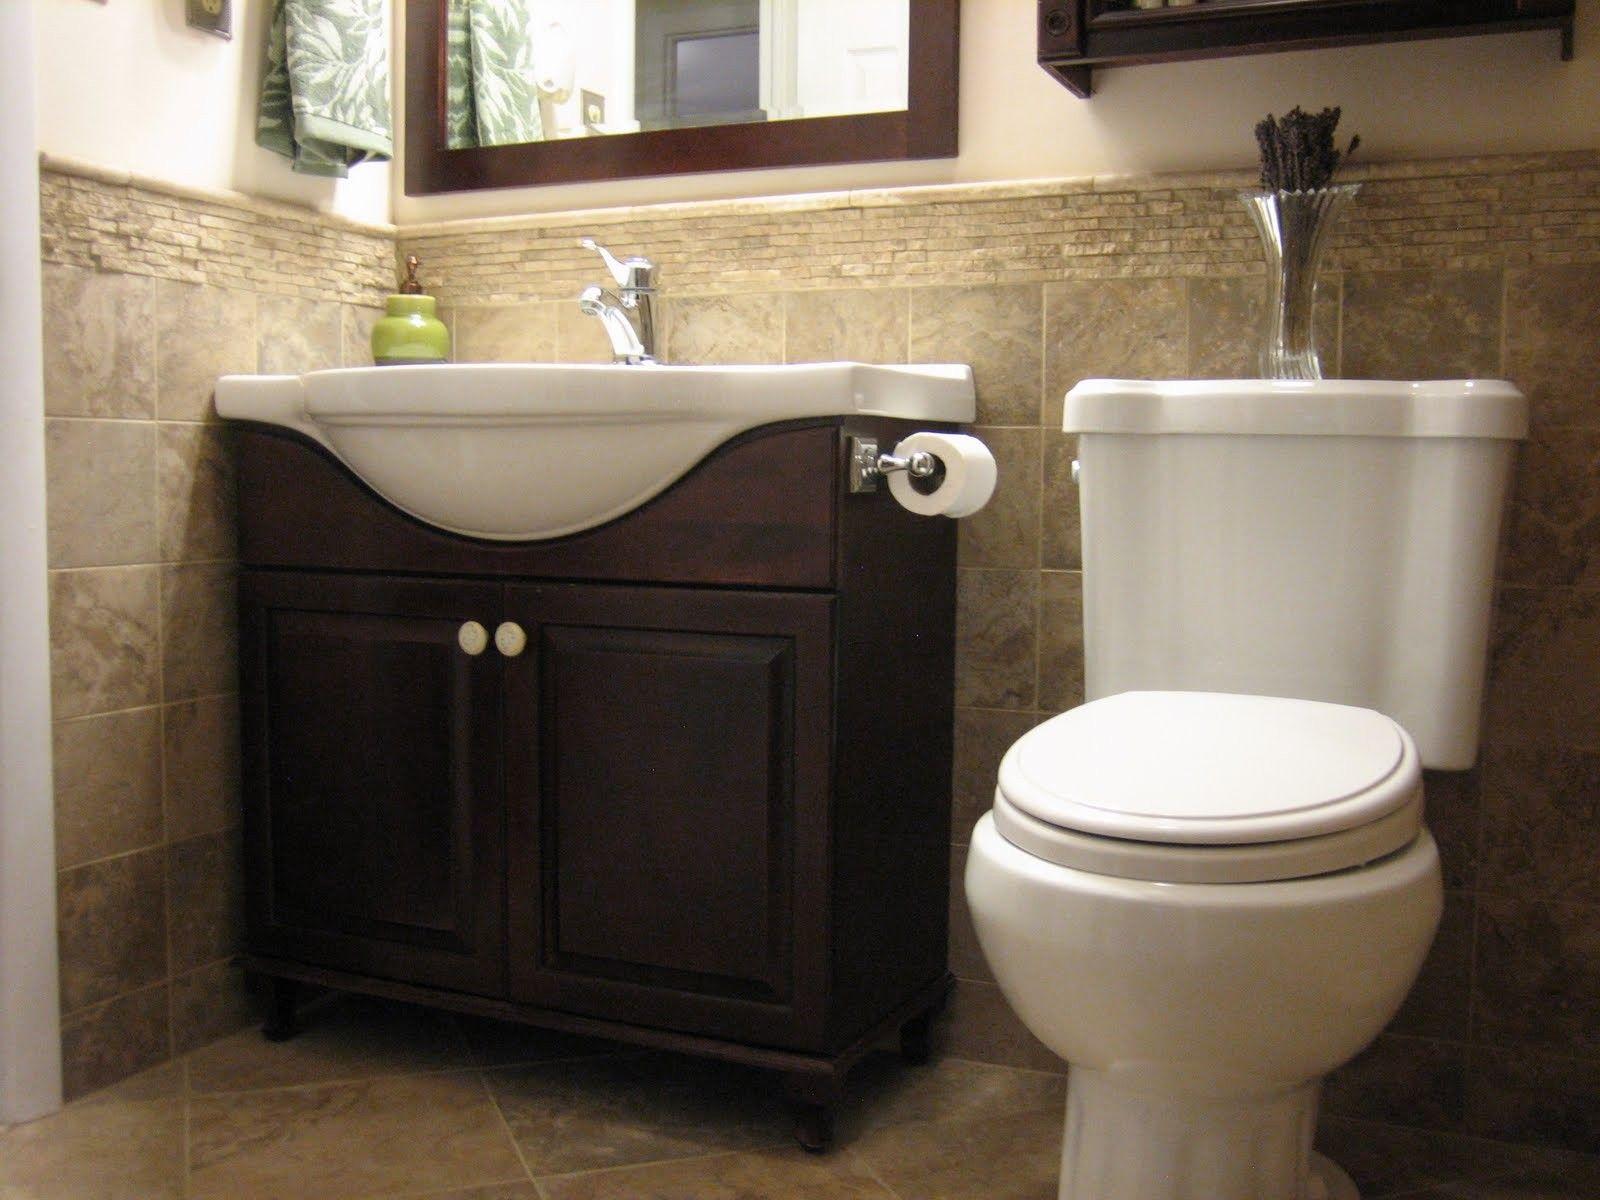 fascinating half bath decorating ideas bathroom | Fresh Small Half Bathroom Designs On Bathroom With Half ...